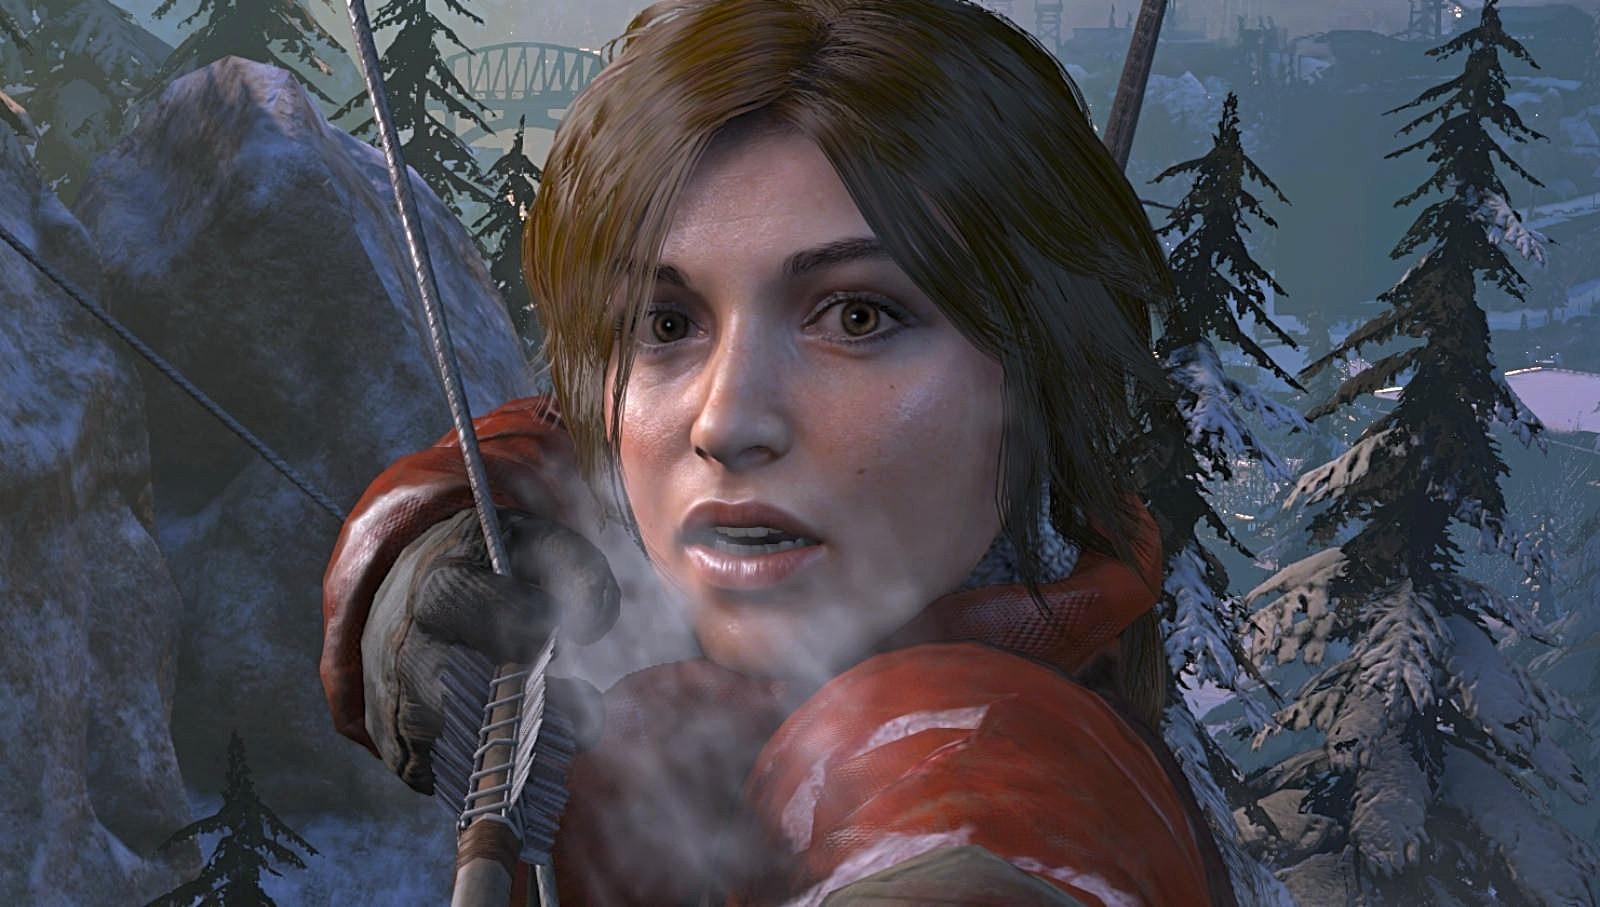 137625258_b (1).jpg - Rise of the Tomb Raider